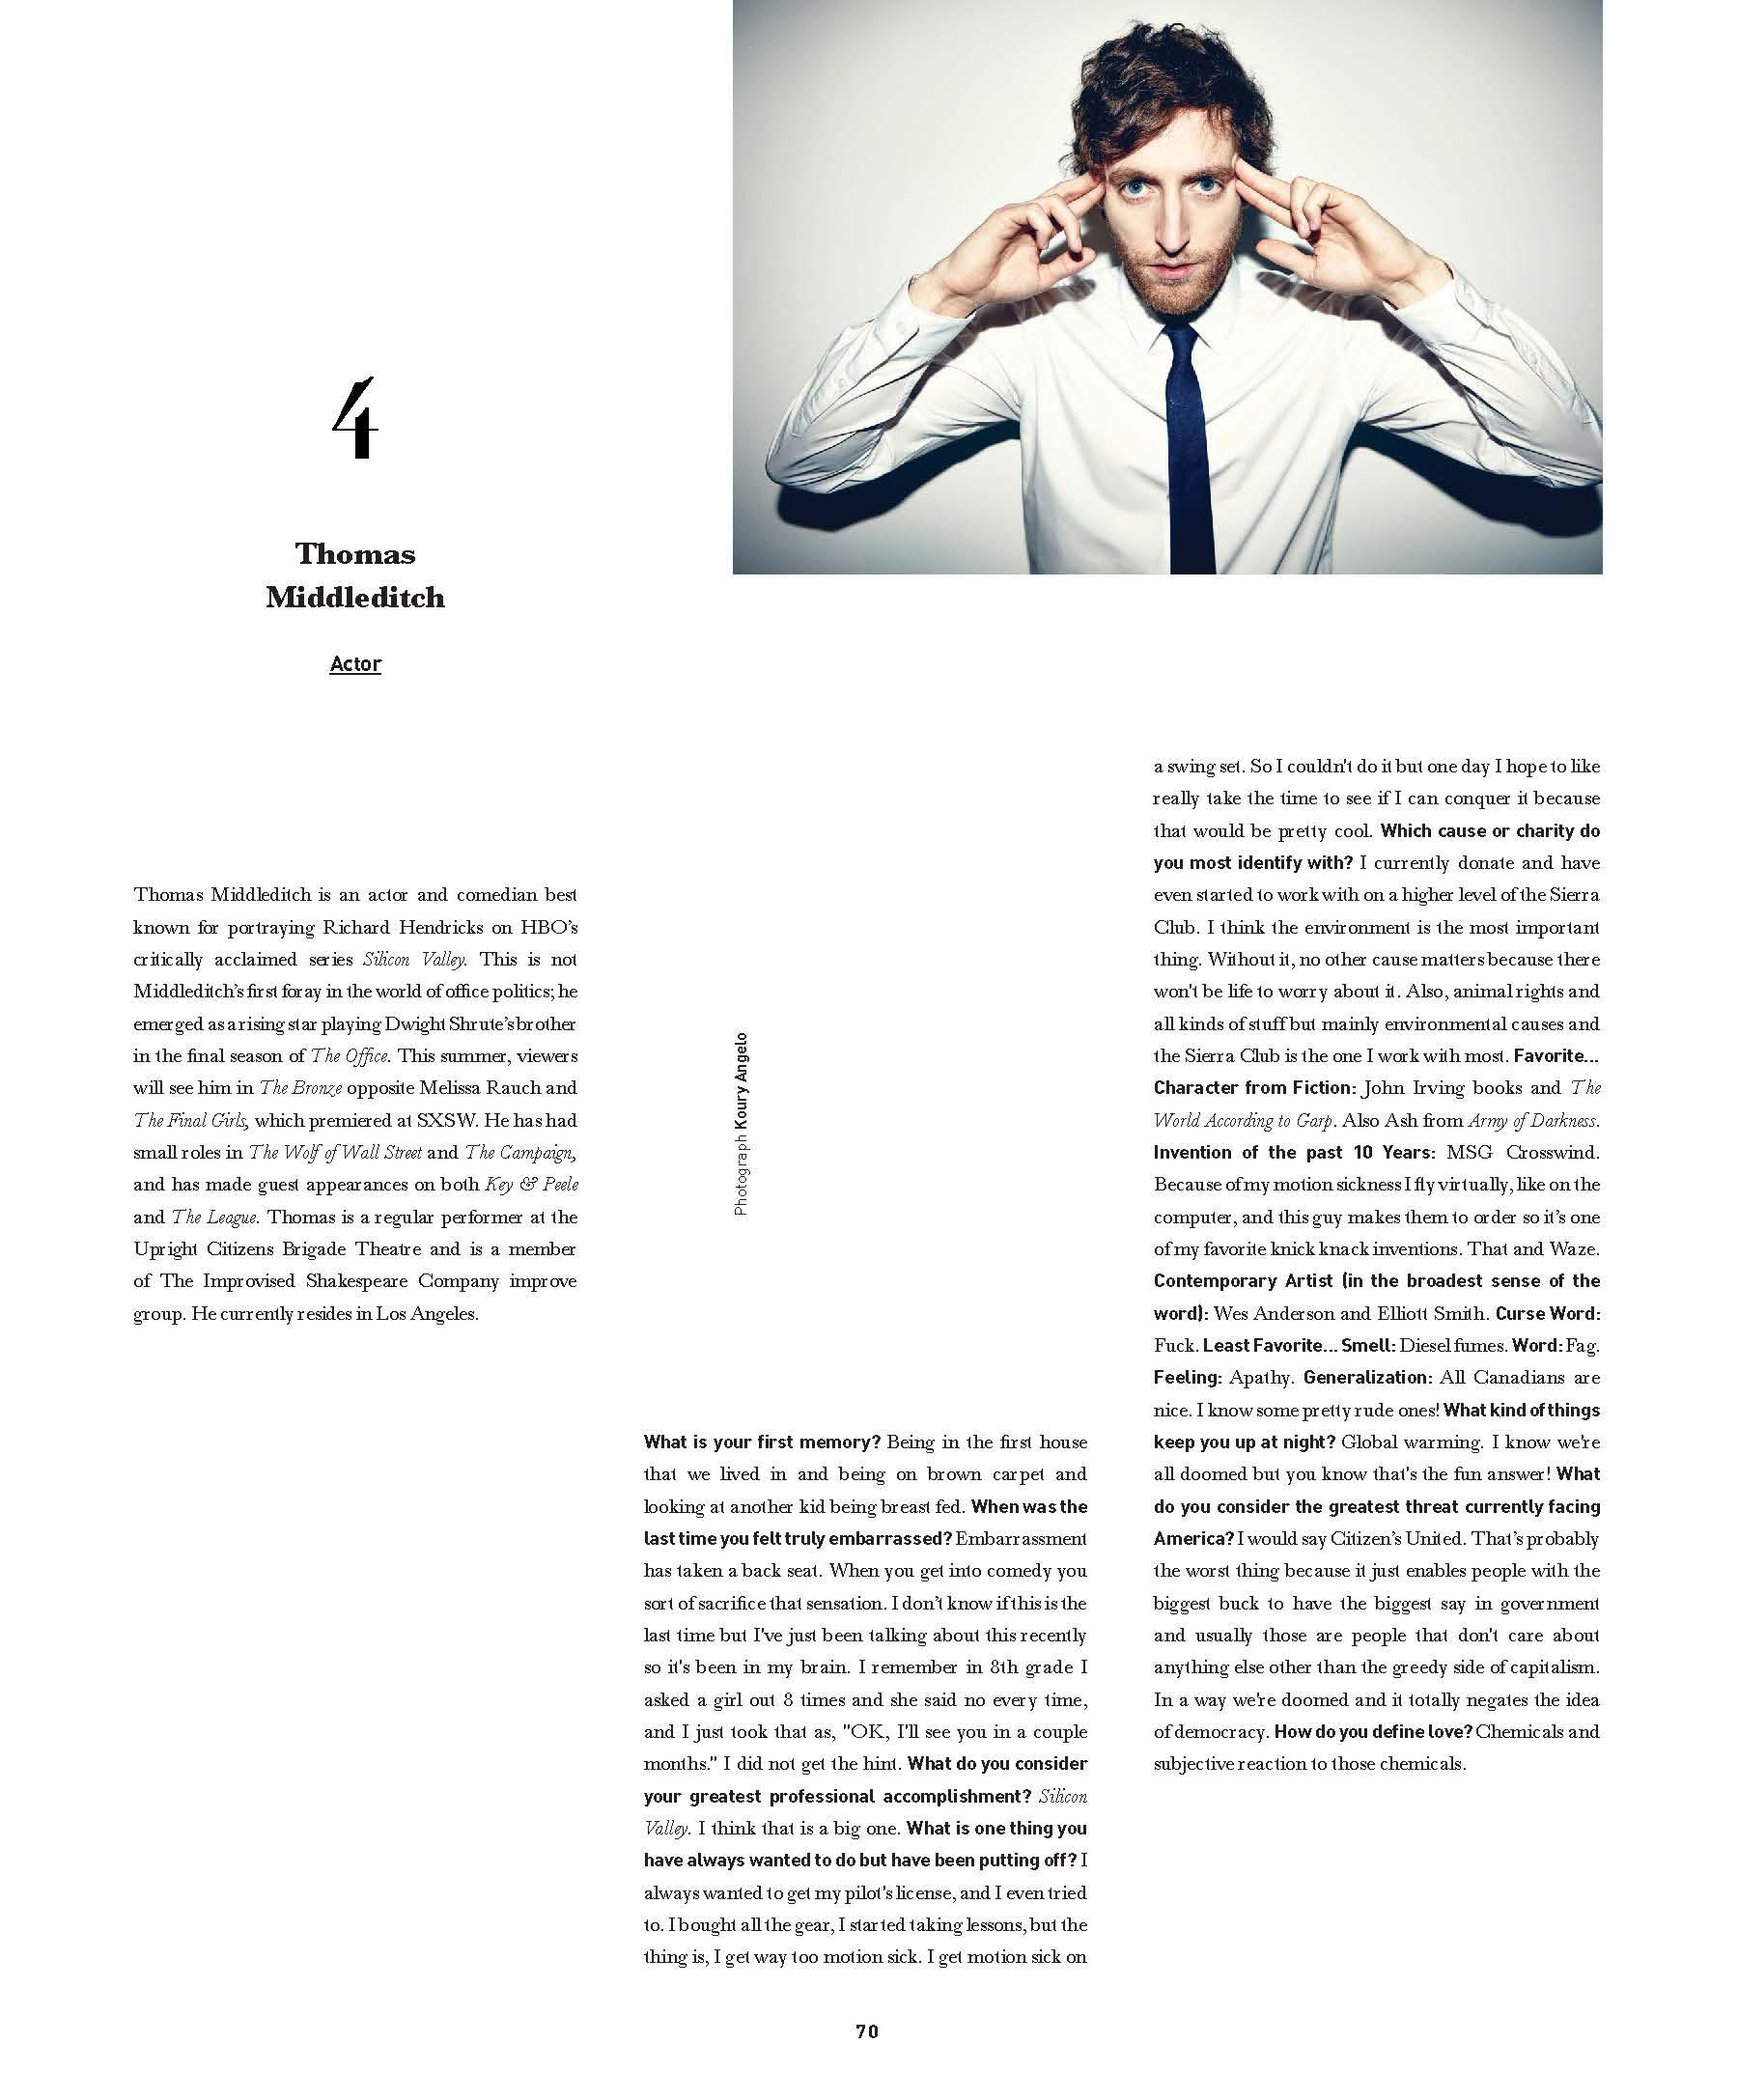 4. Thomas Middleditch.jpg